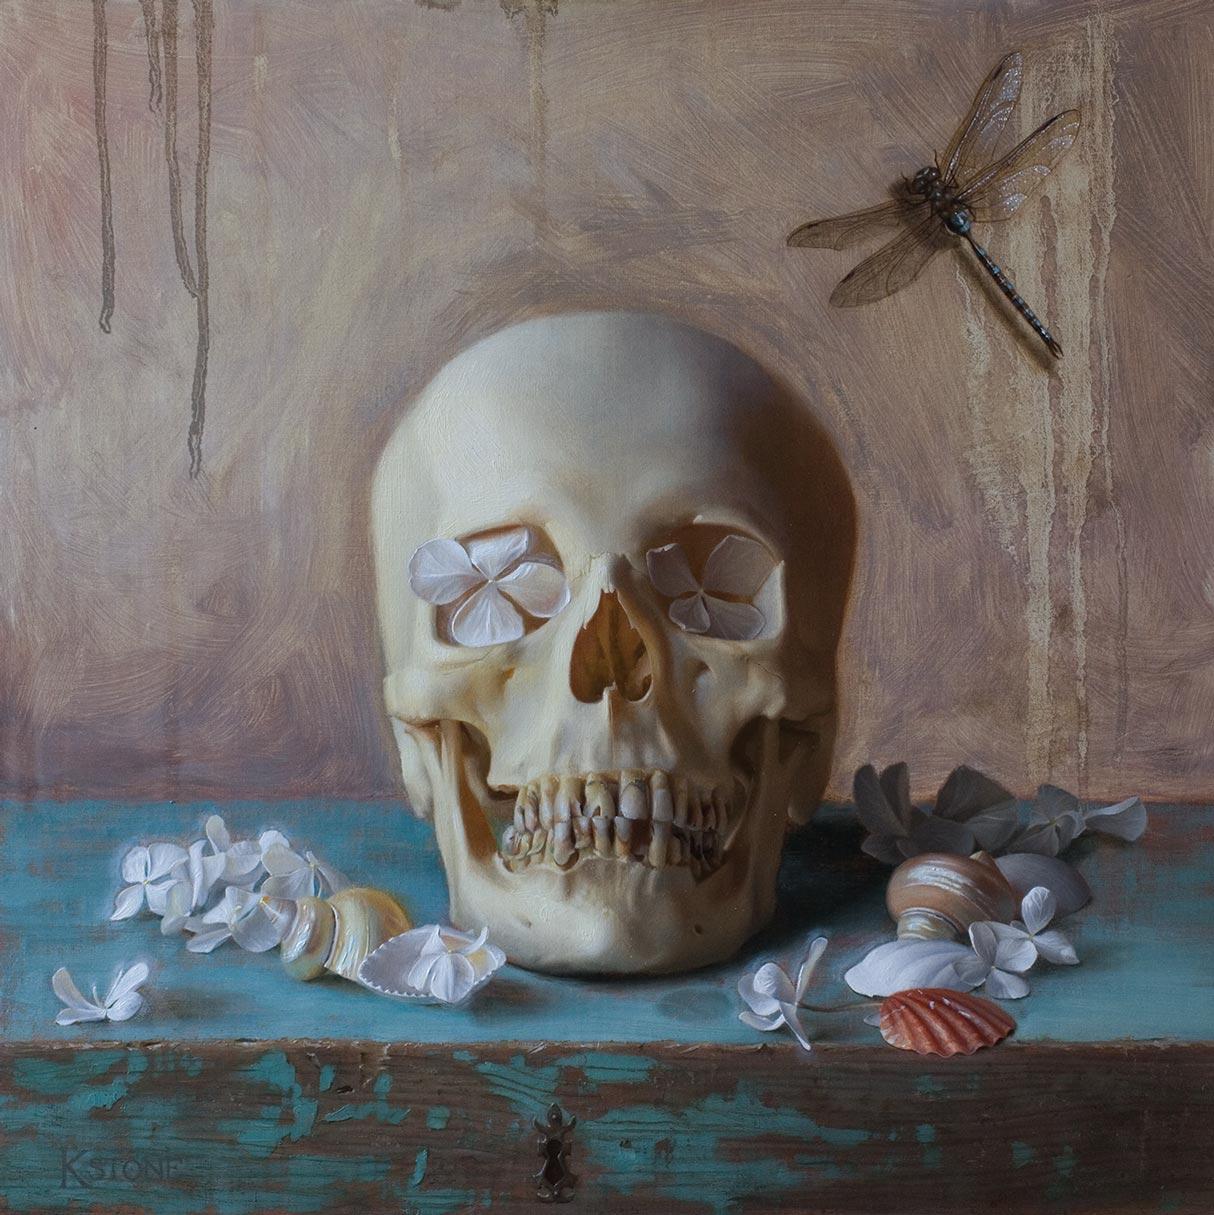 Vanitas, Katherine Stone. oil on linen on panel, 2012